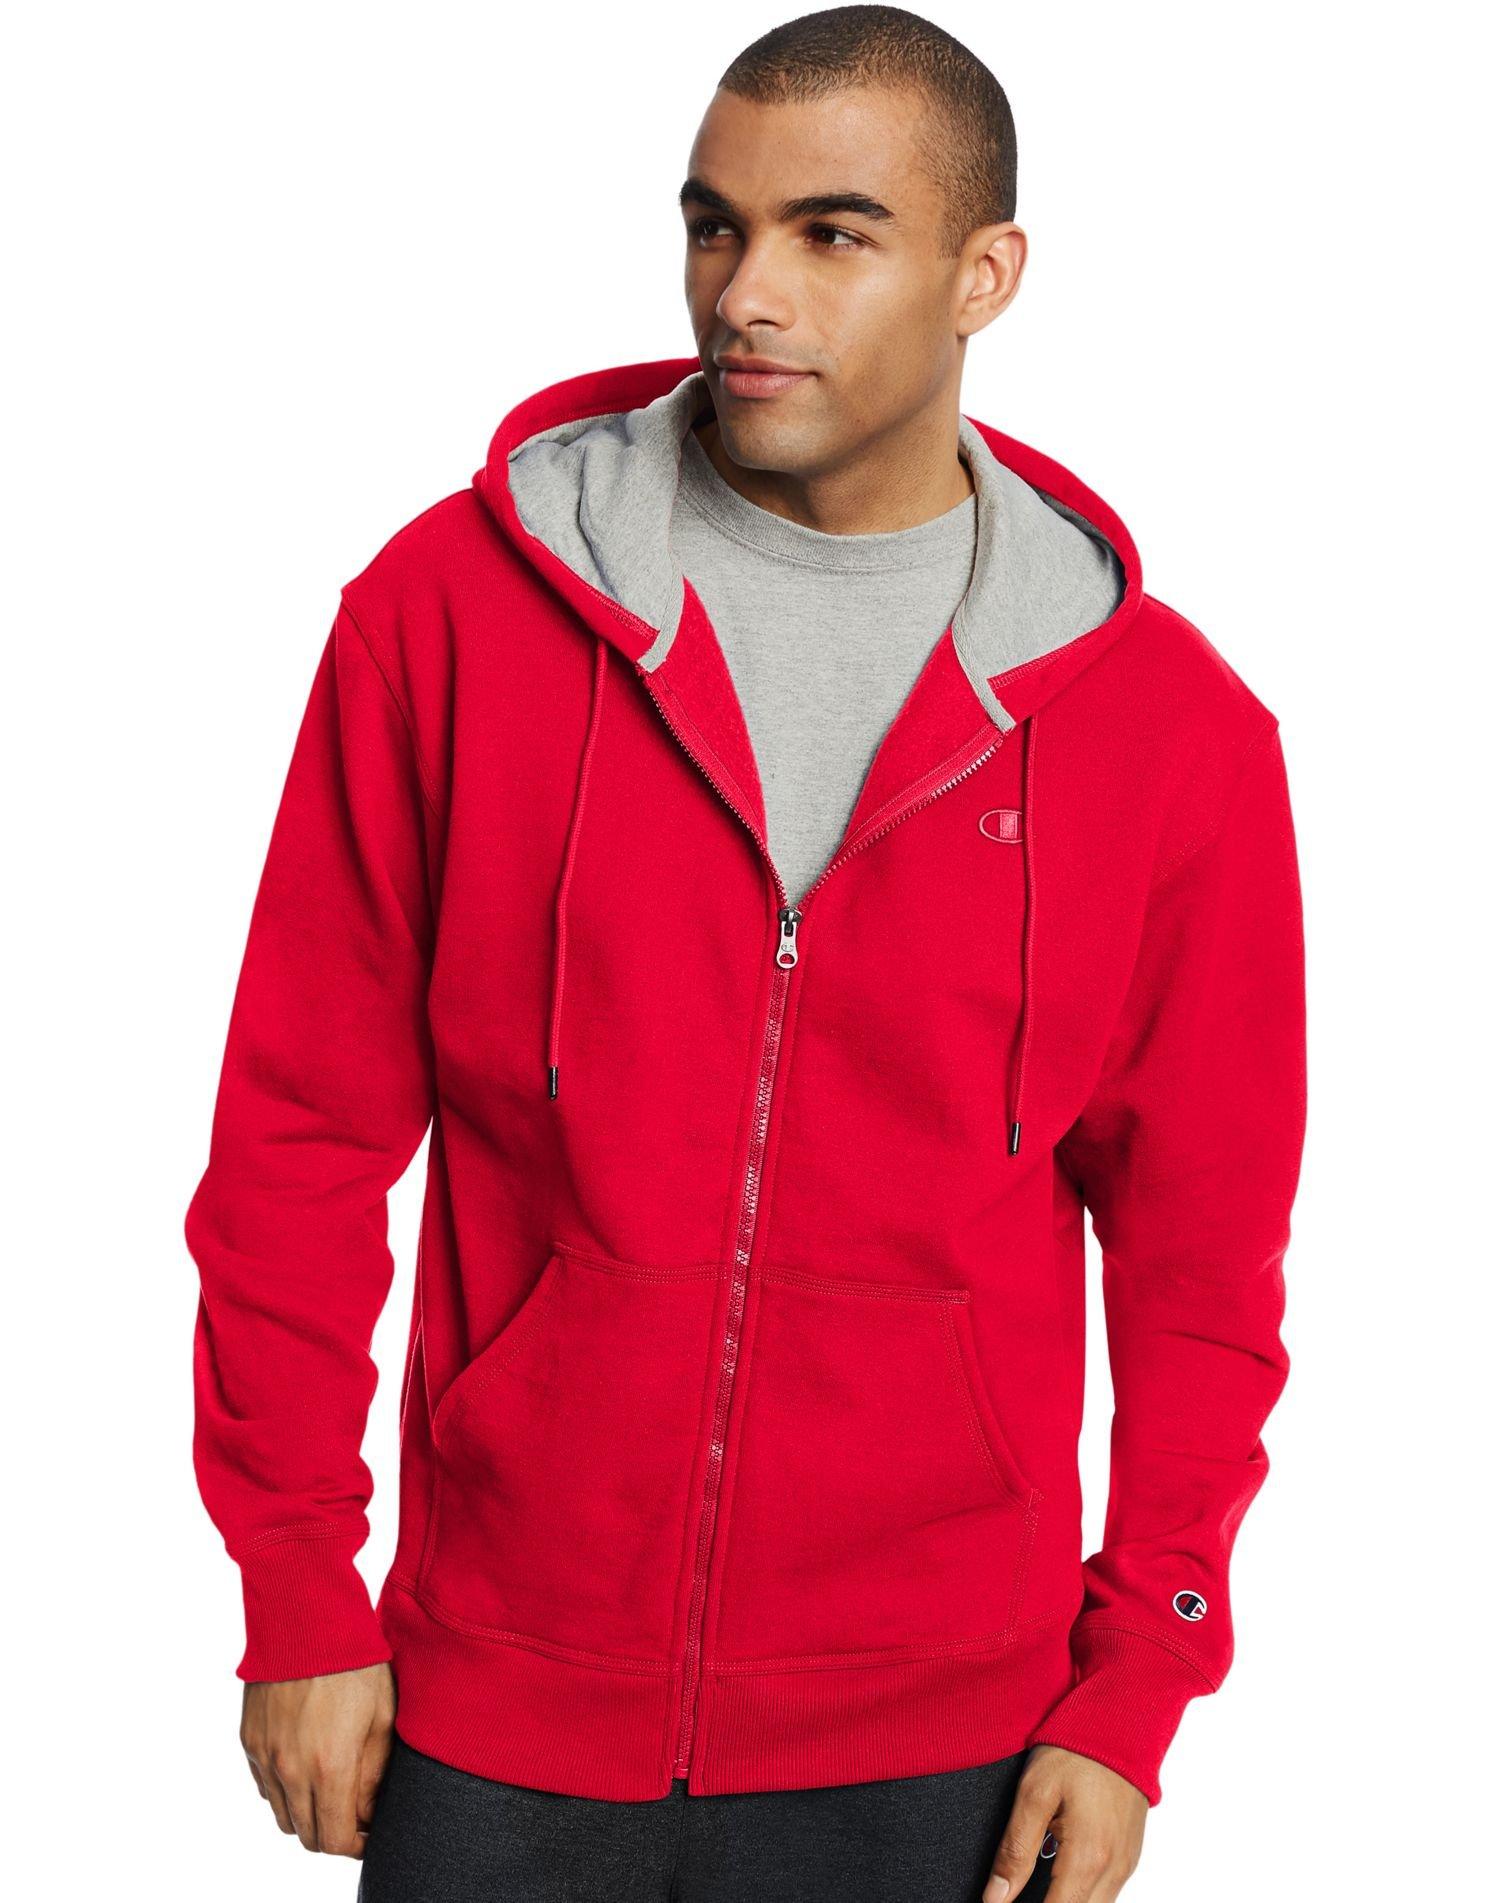 Champion Men`s Powerblend Fleece Full Zip Jacket, 4XL, Team Red Scarlet